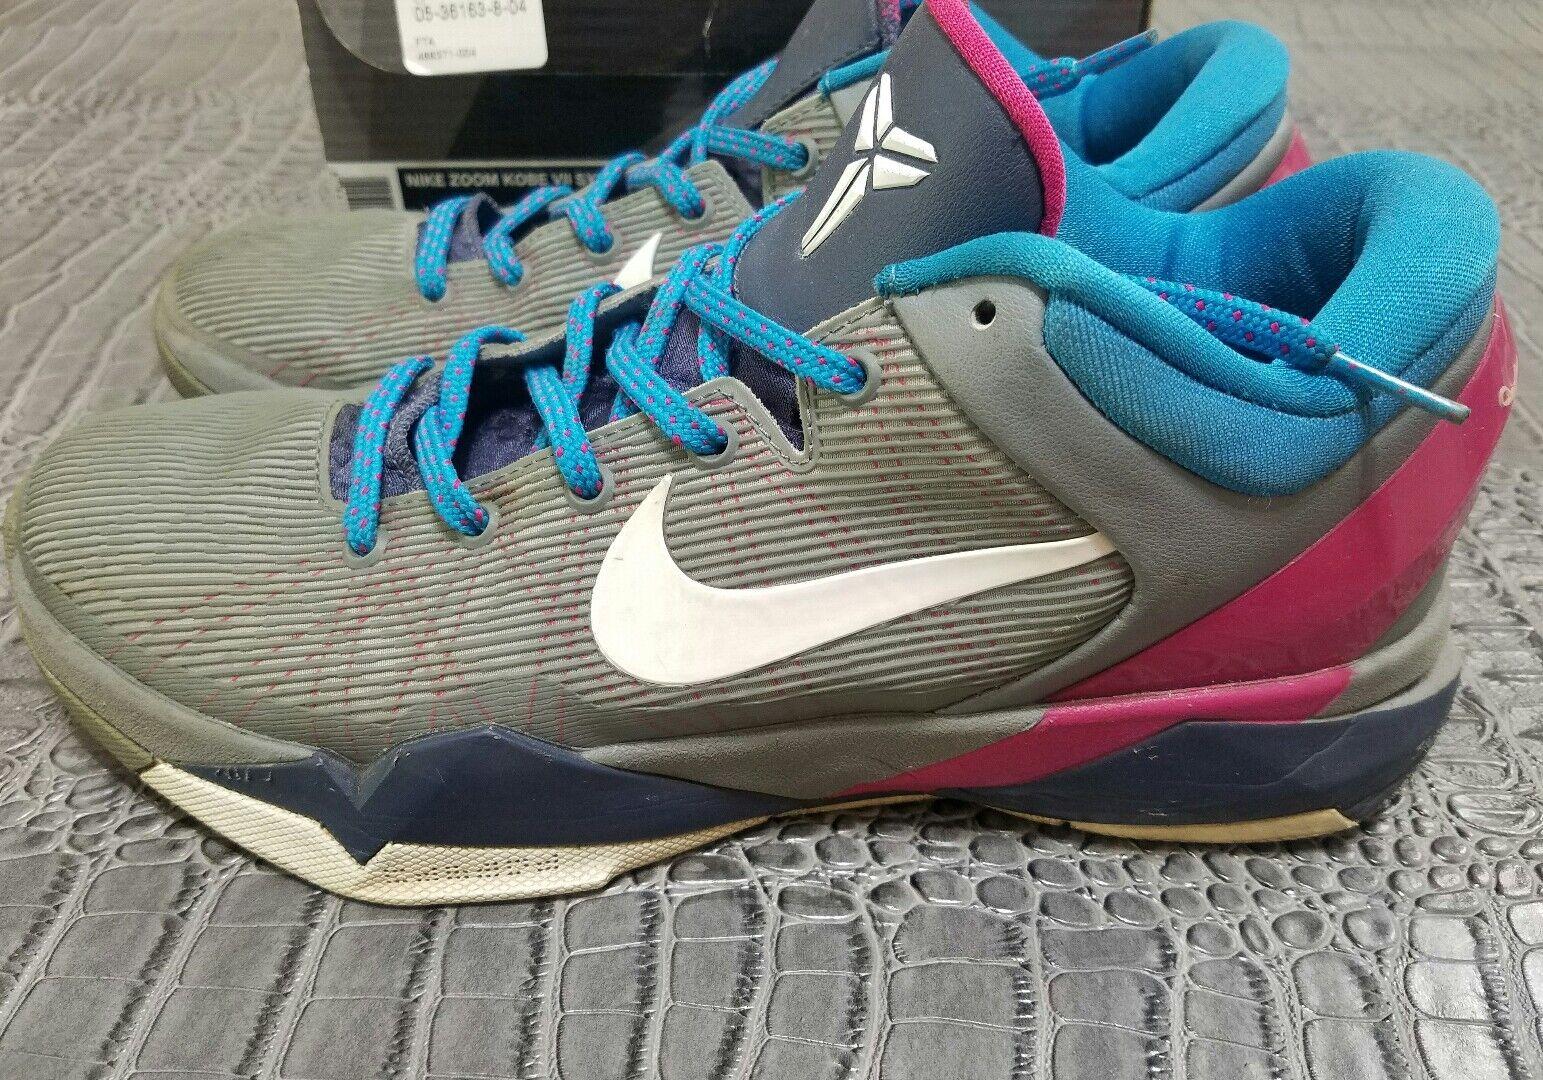 Nike Zoom KOBE VII 7 SYSTEM WBF COOL GREY WHITE BLUE FIREBERRY  488371-004 8.5